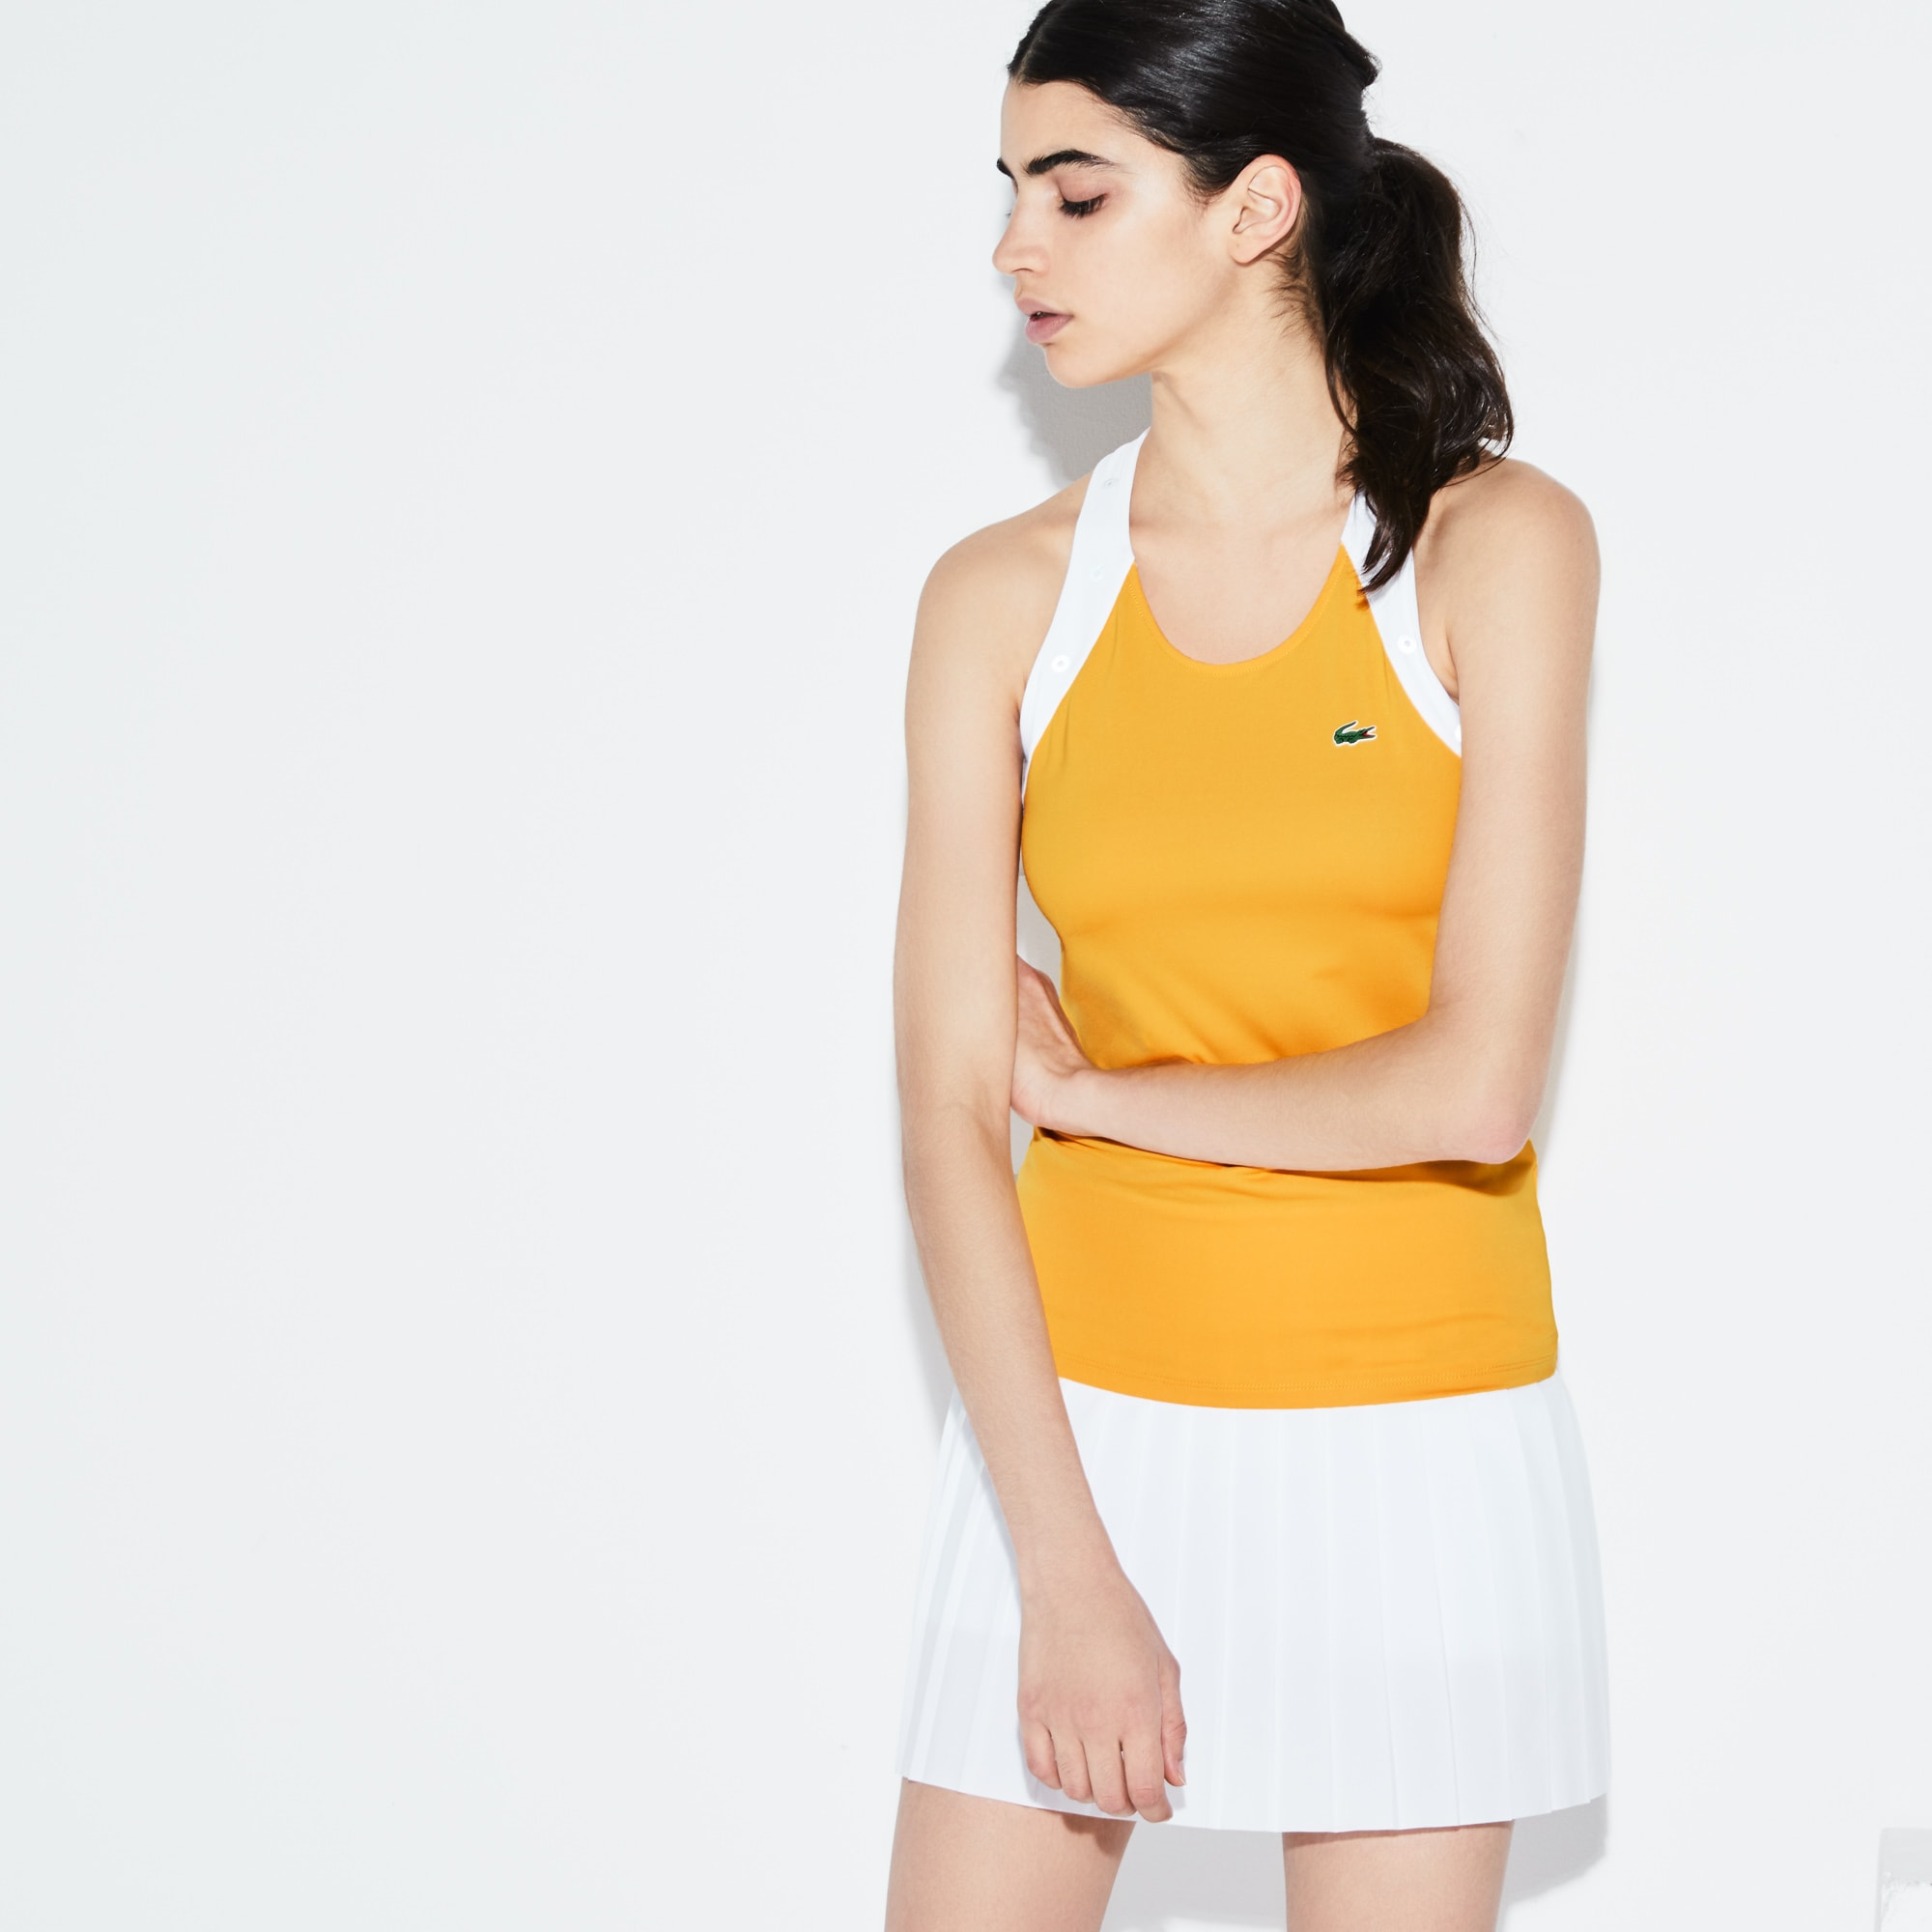 Damen LACOSTE SPORT zweifarbiges Racerback Tennis-Top aus Jersey